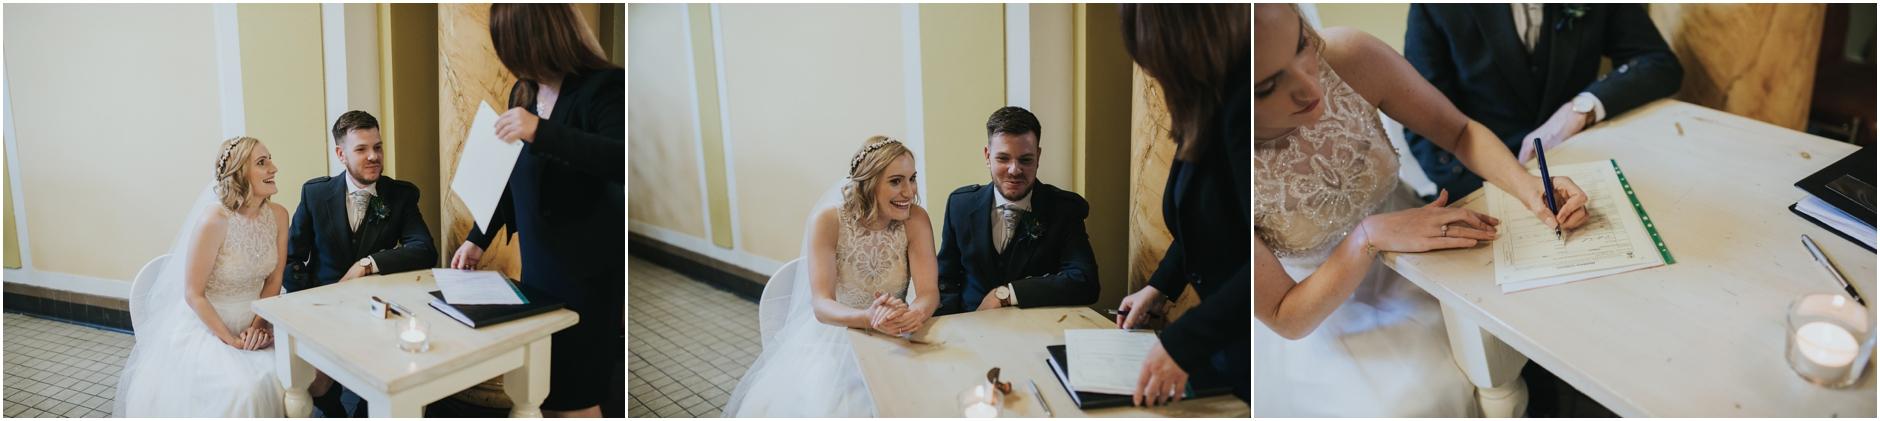 wedding ceremony at thomas morton hall edinburgh leith theatre